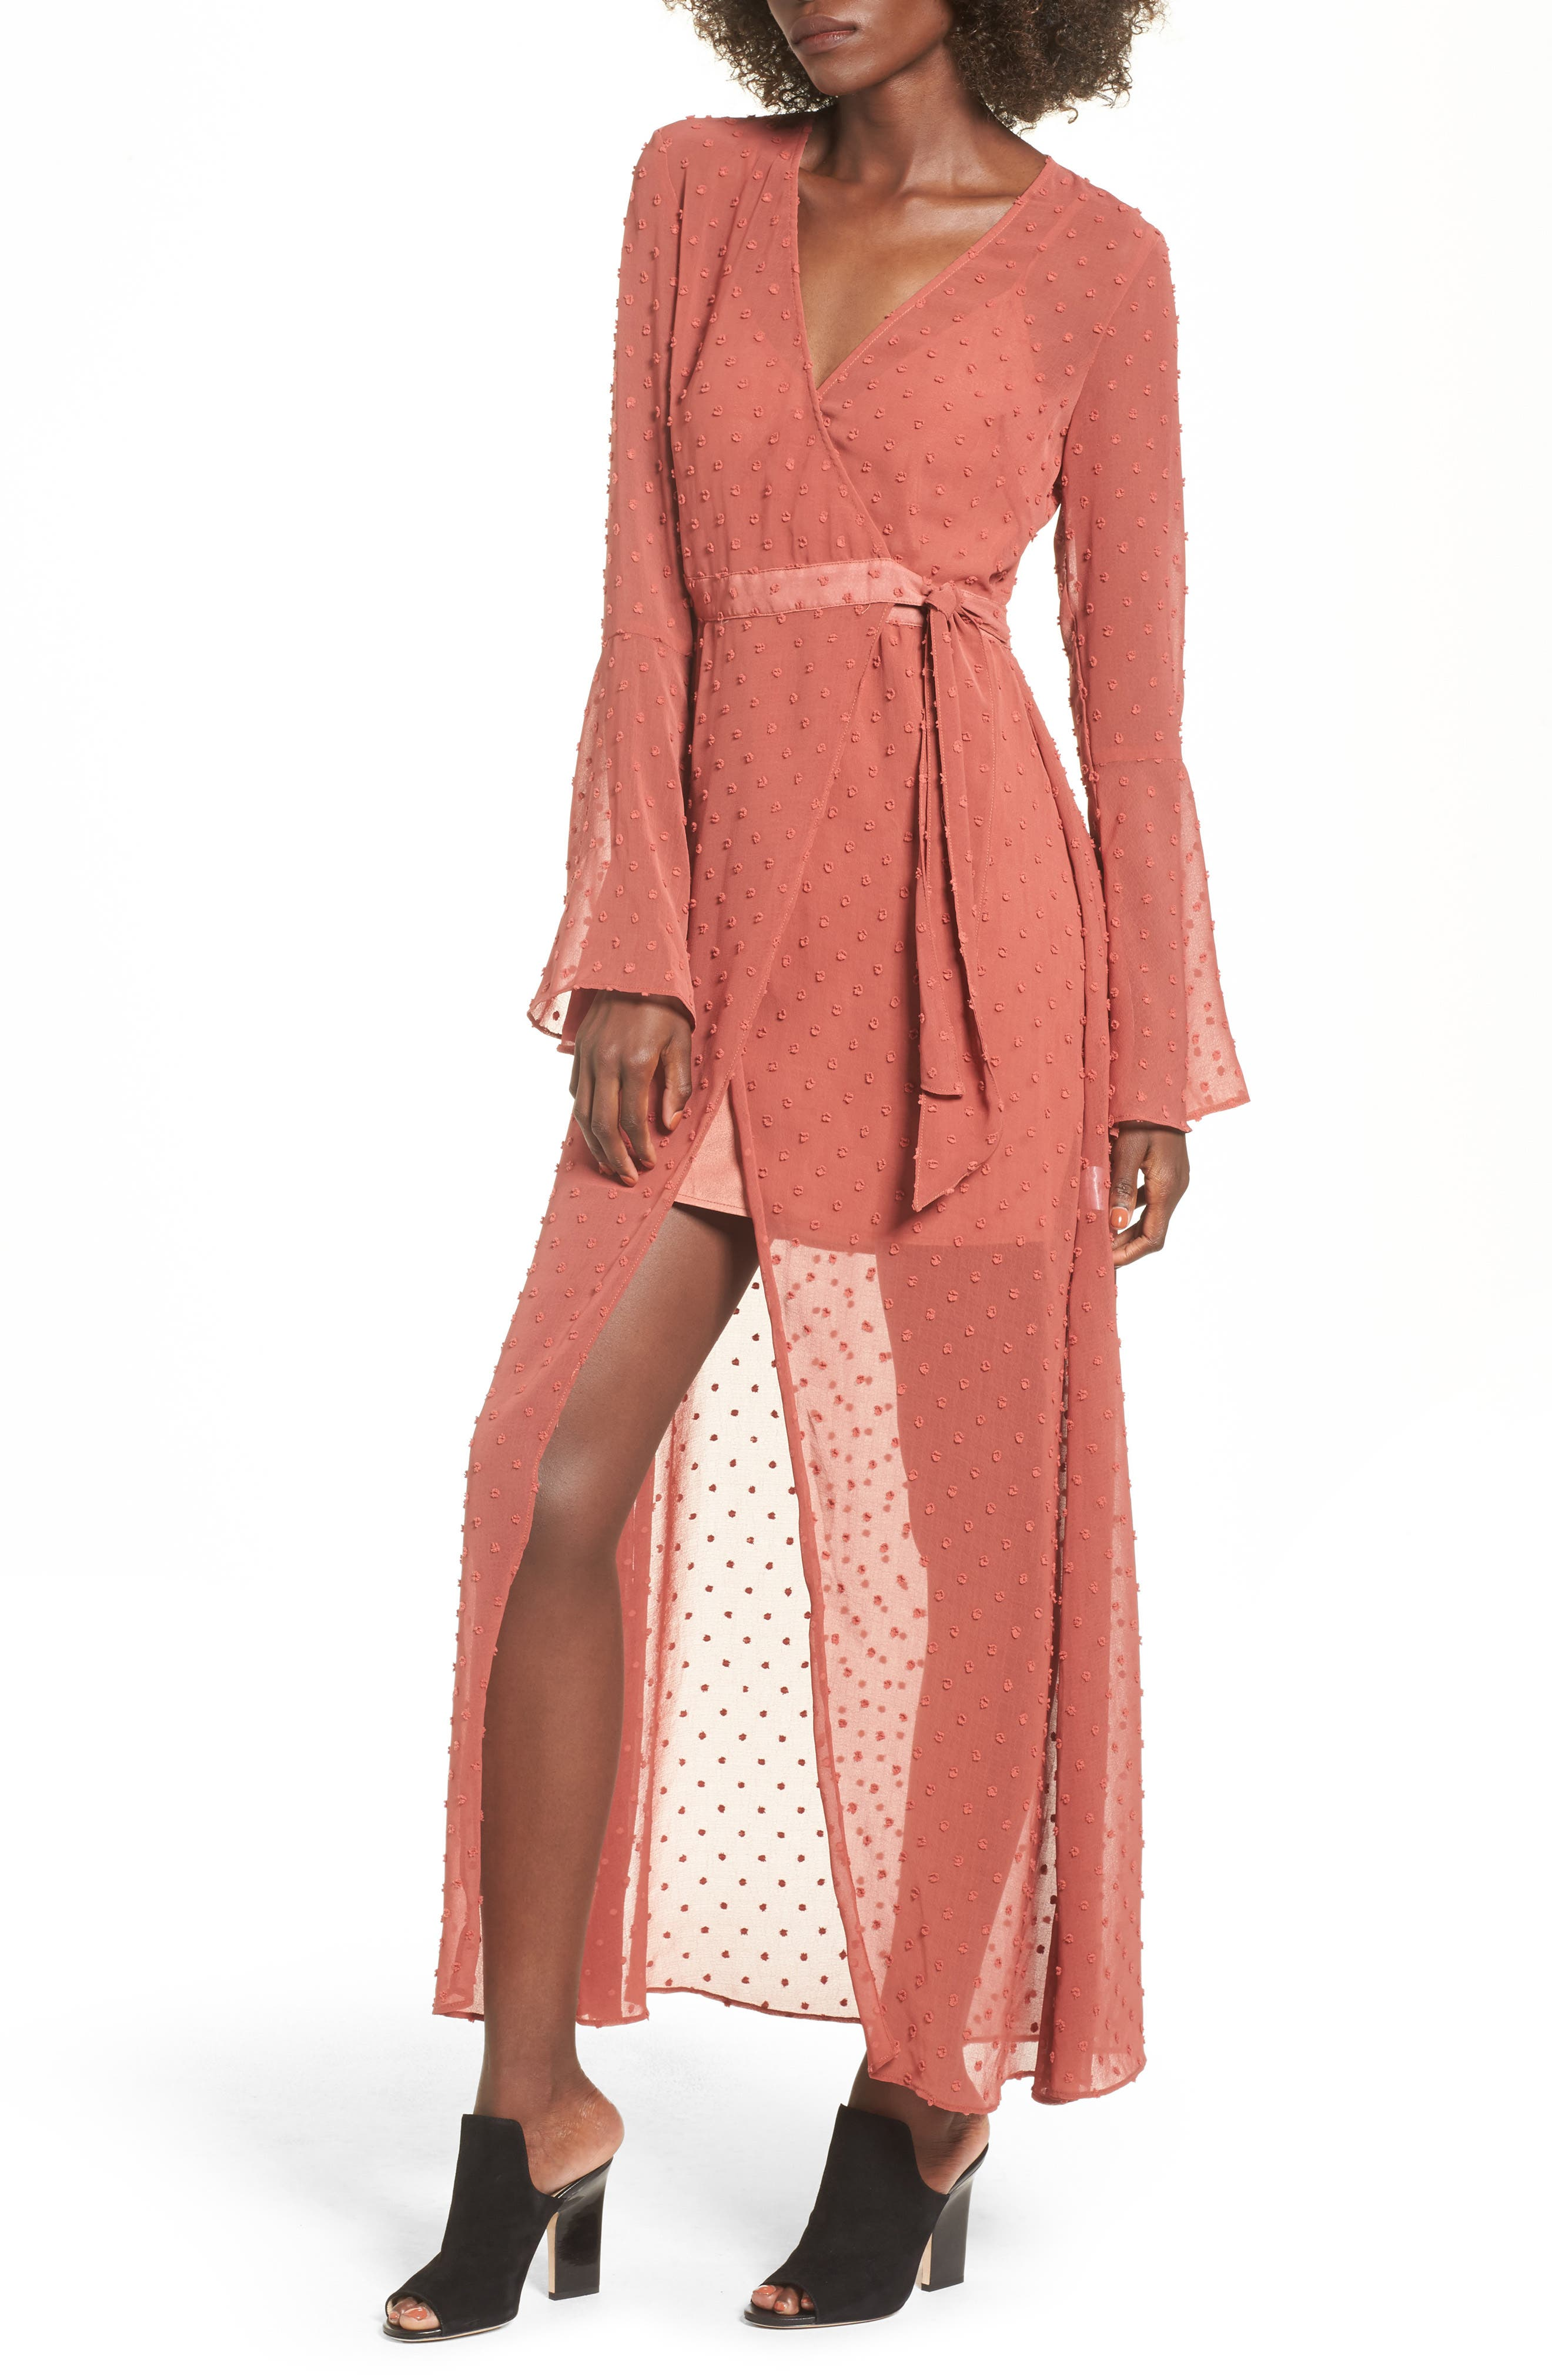 Freya Bell Sleeve Wrap Maxi Dress,                             Main thumbnail 1, color,                             200